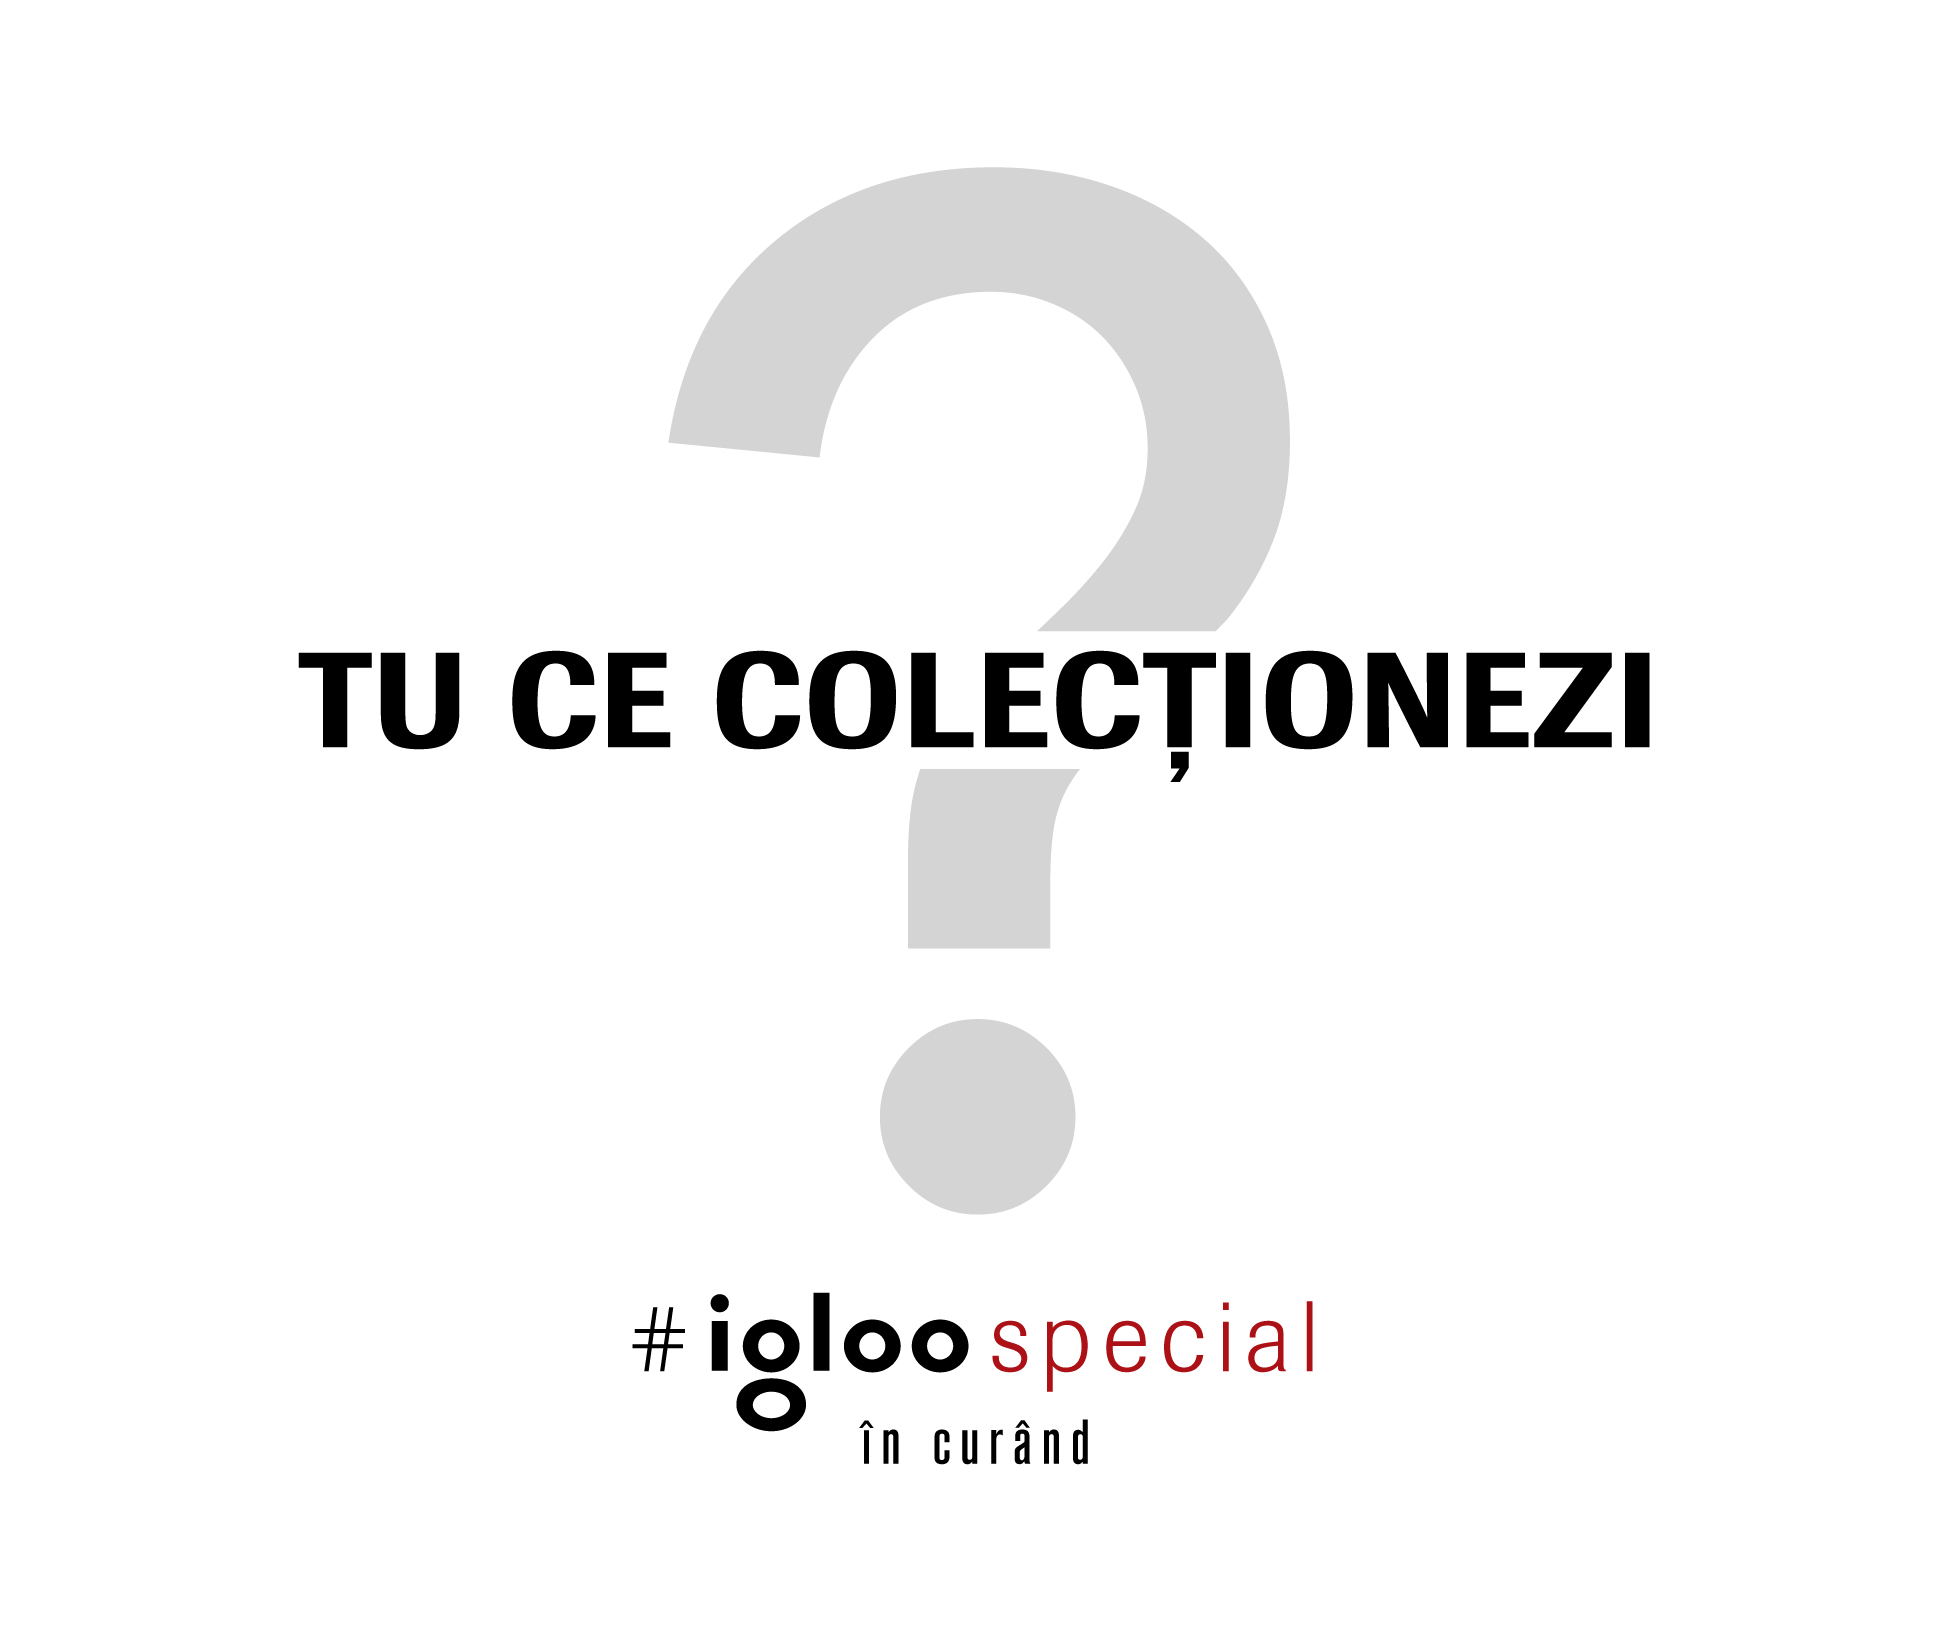 #igloospecial